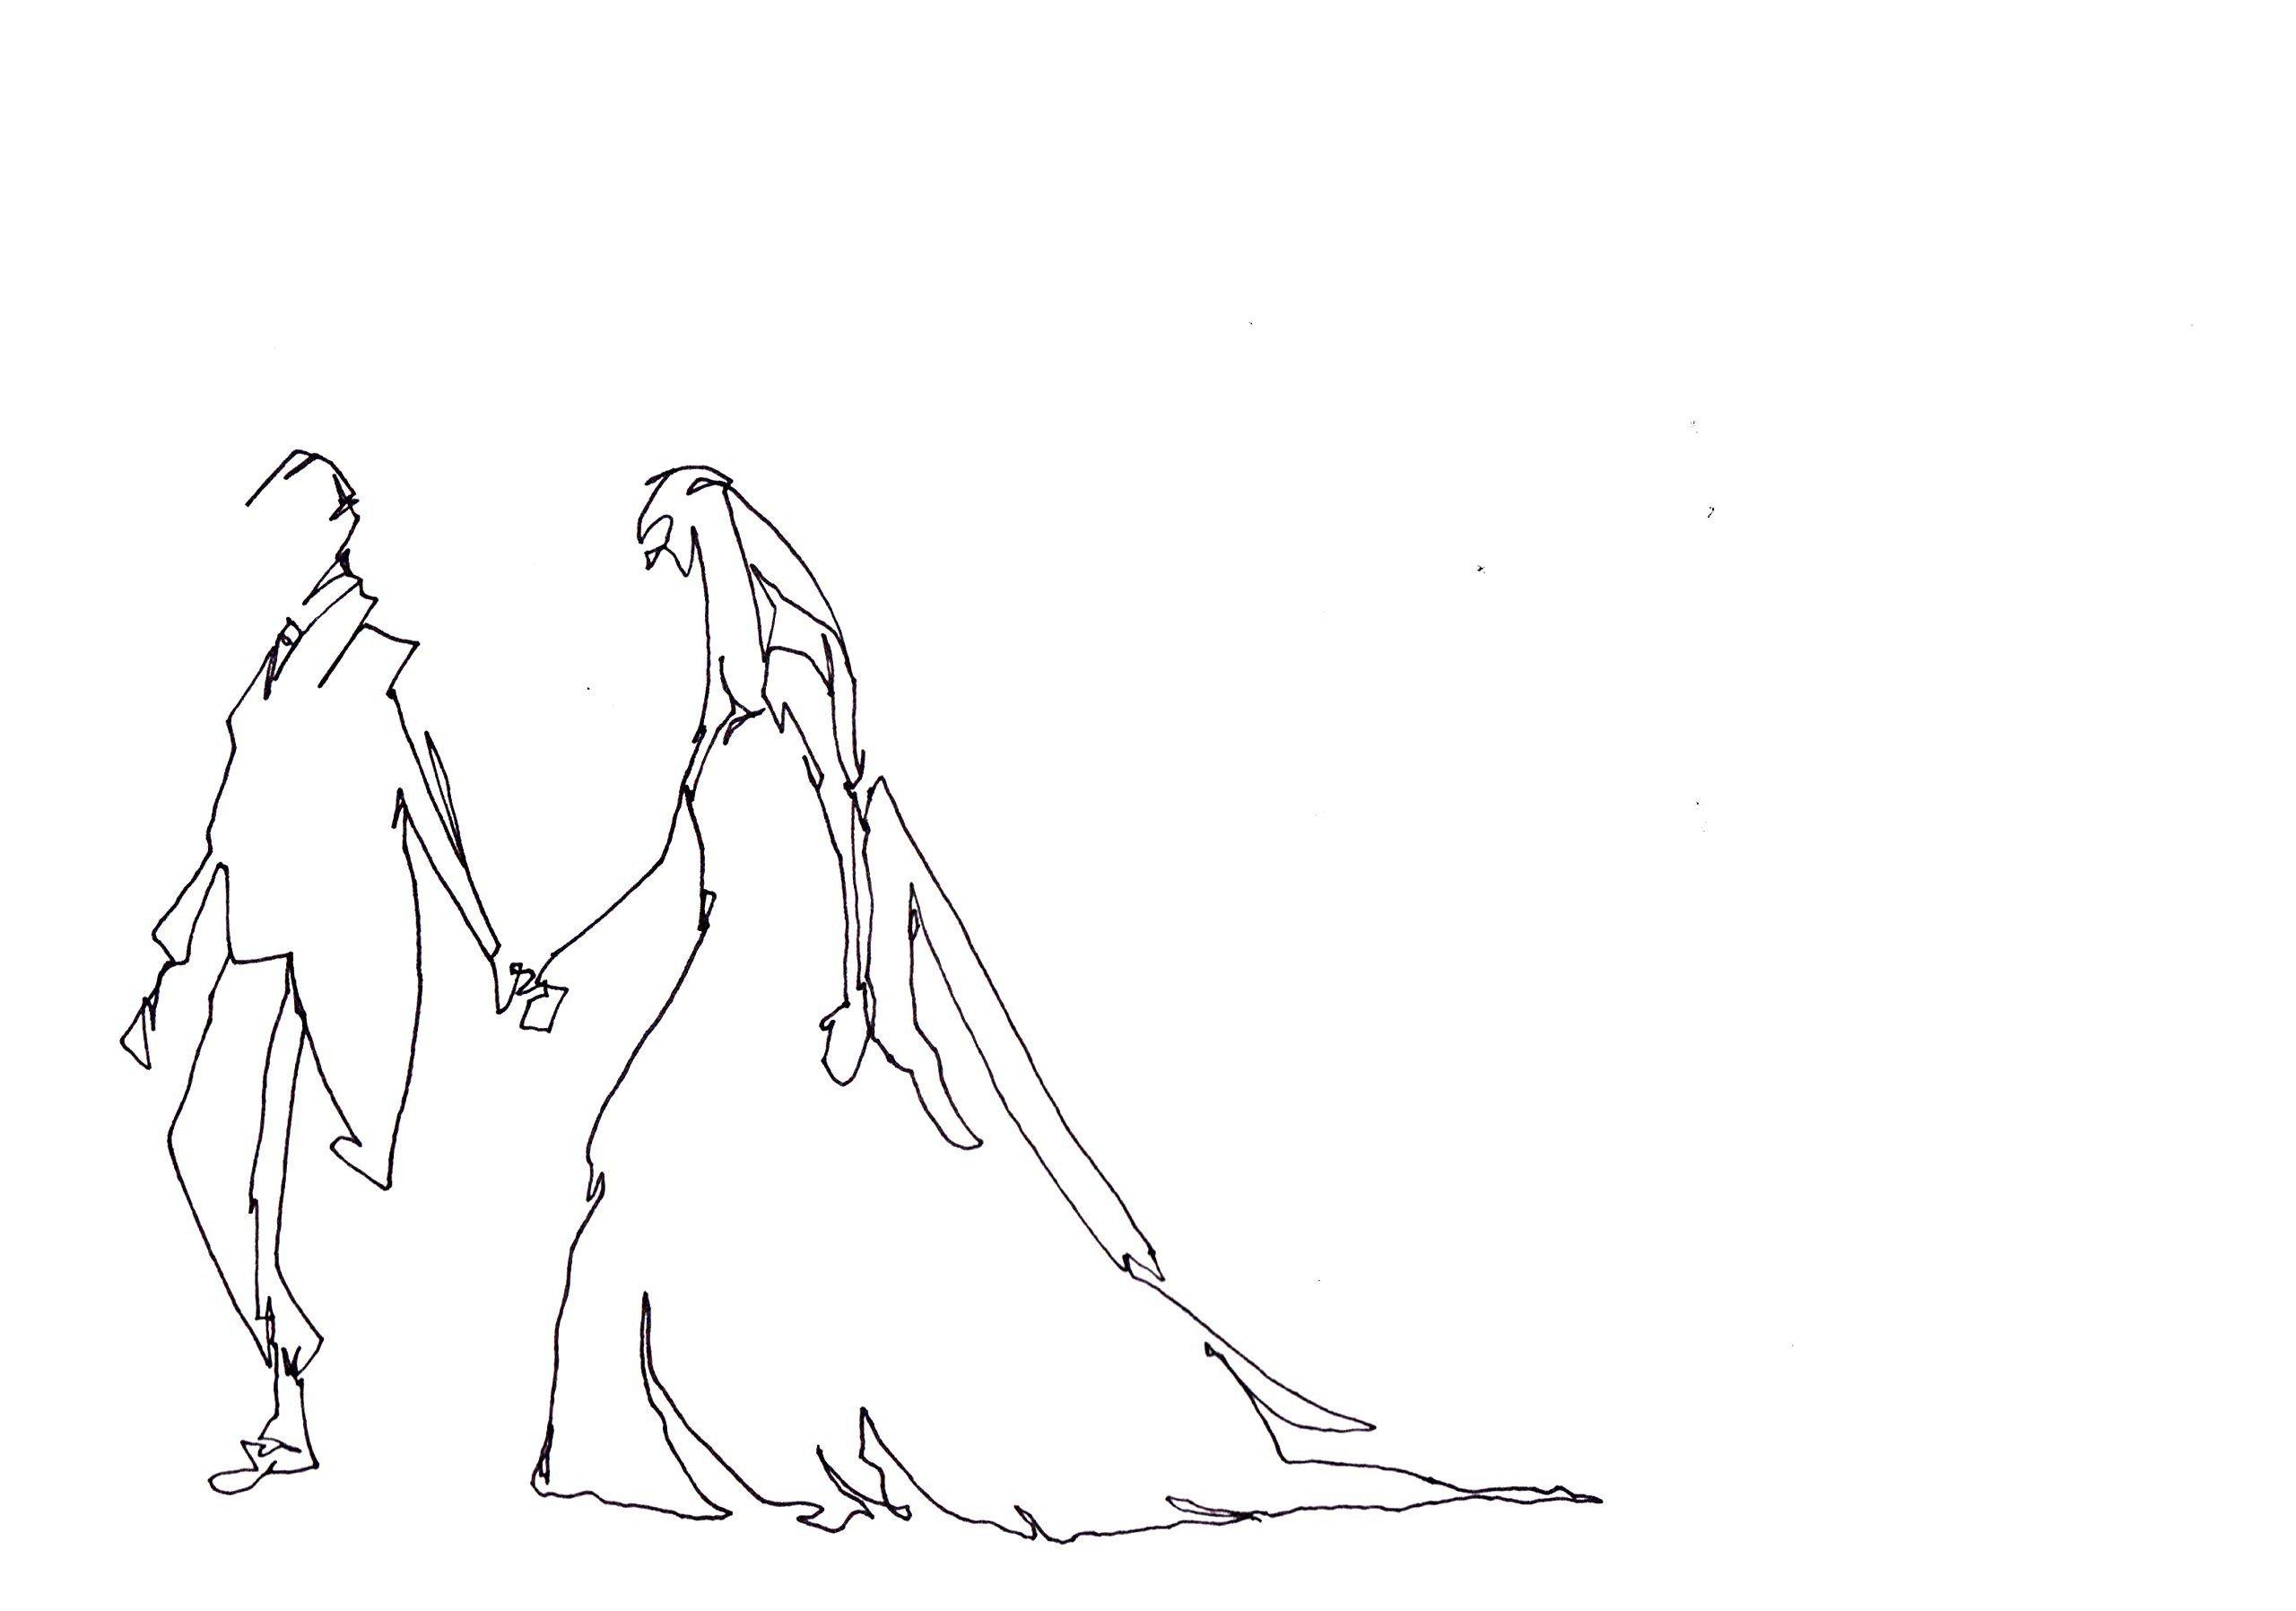 Wedding Walk by Love Lines